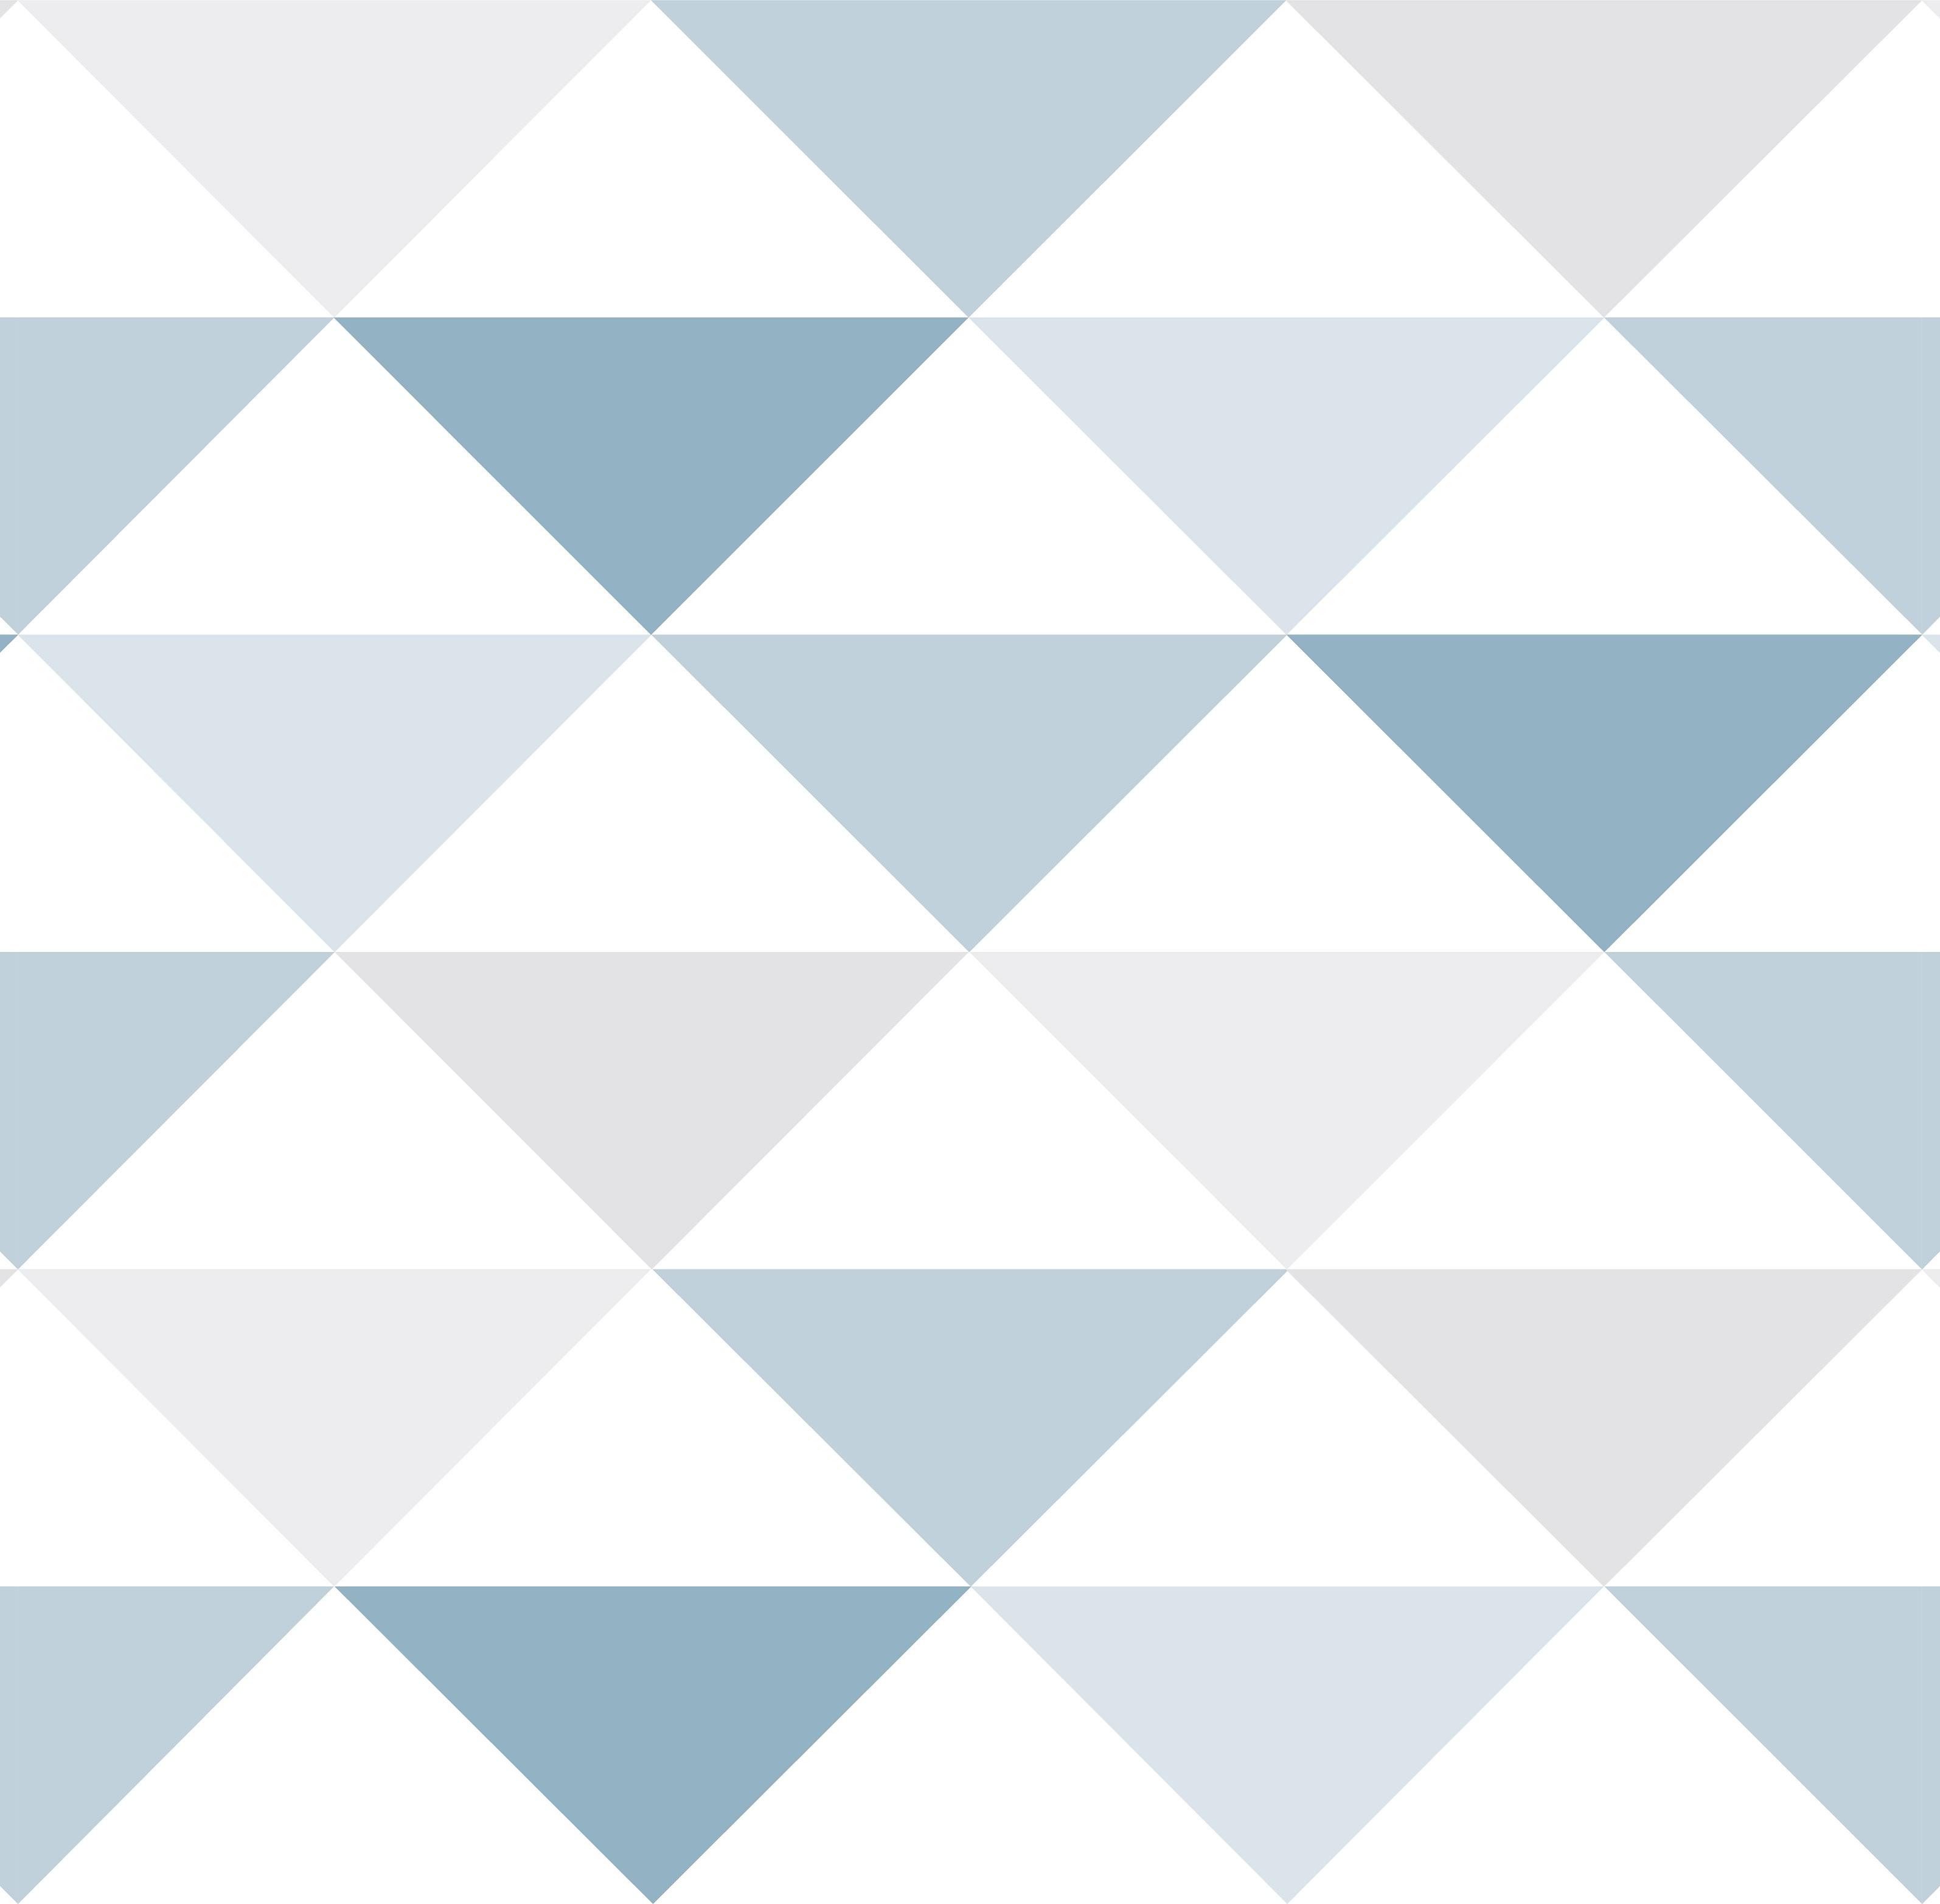 Geométrico triângulos_Variação_01